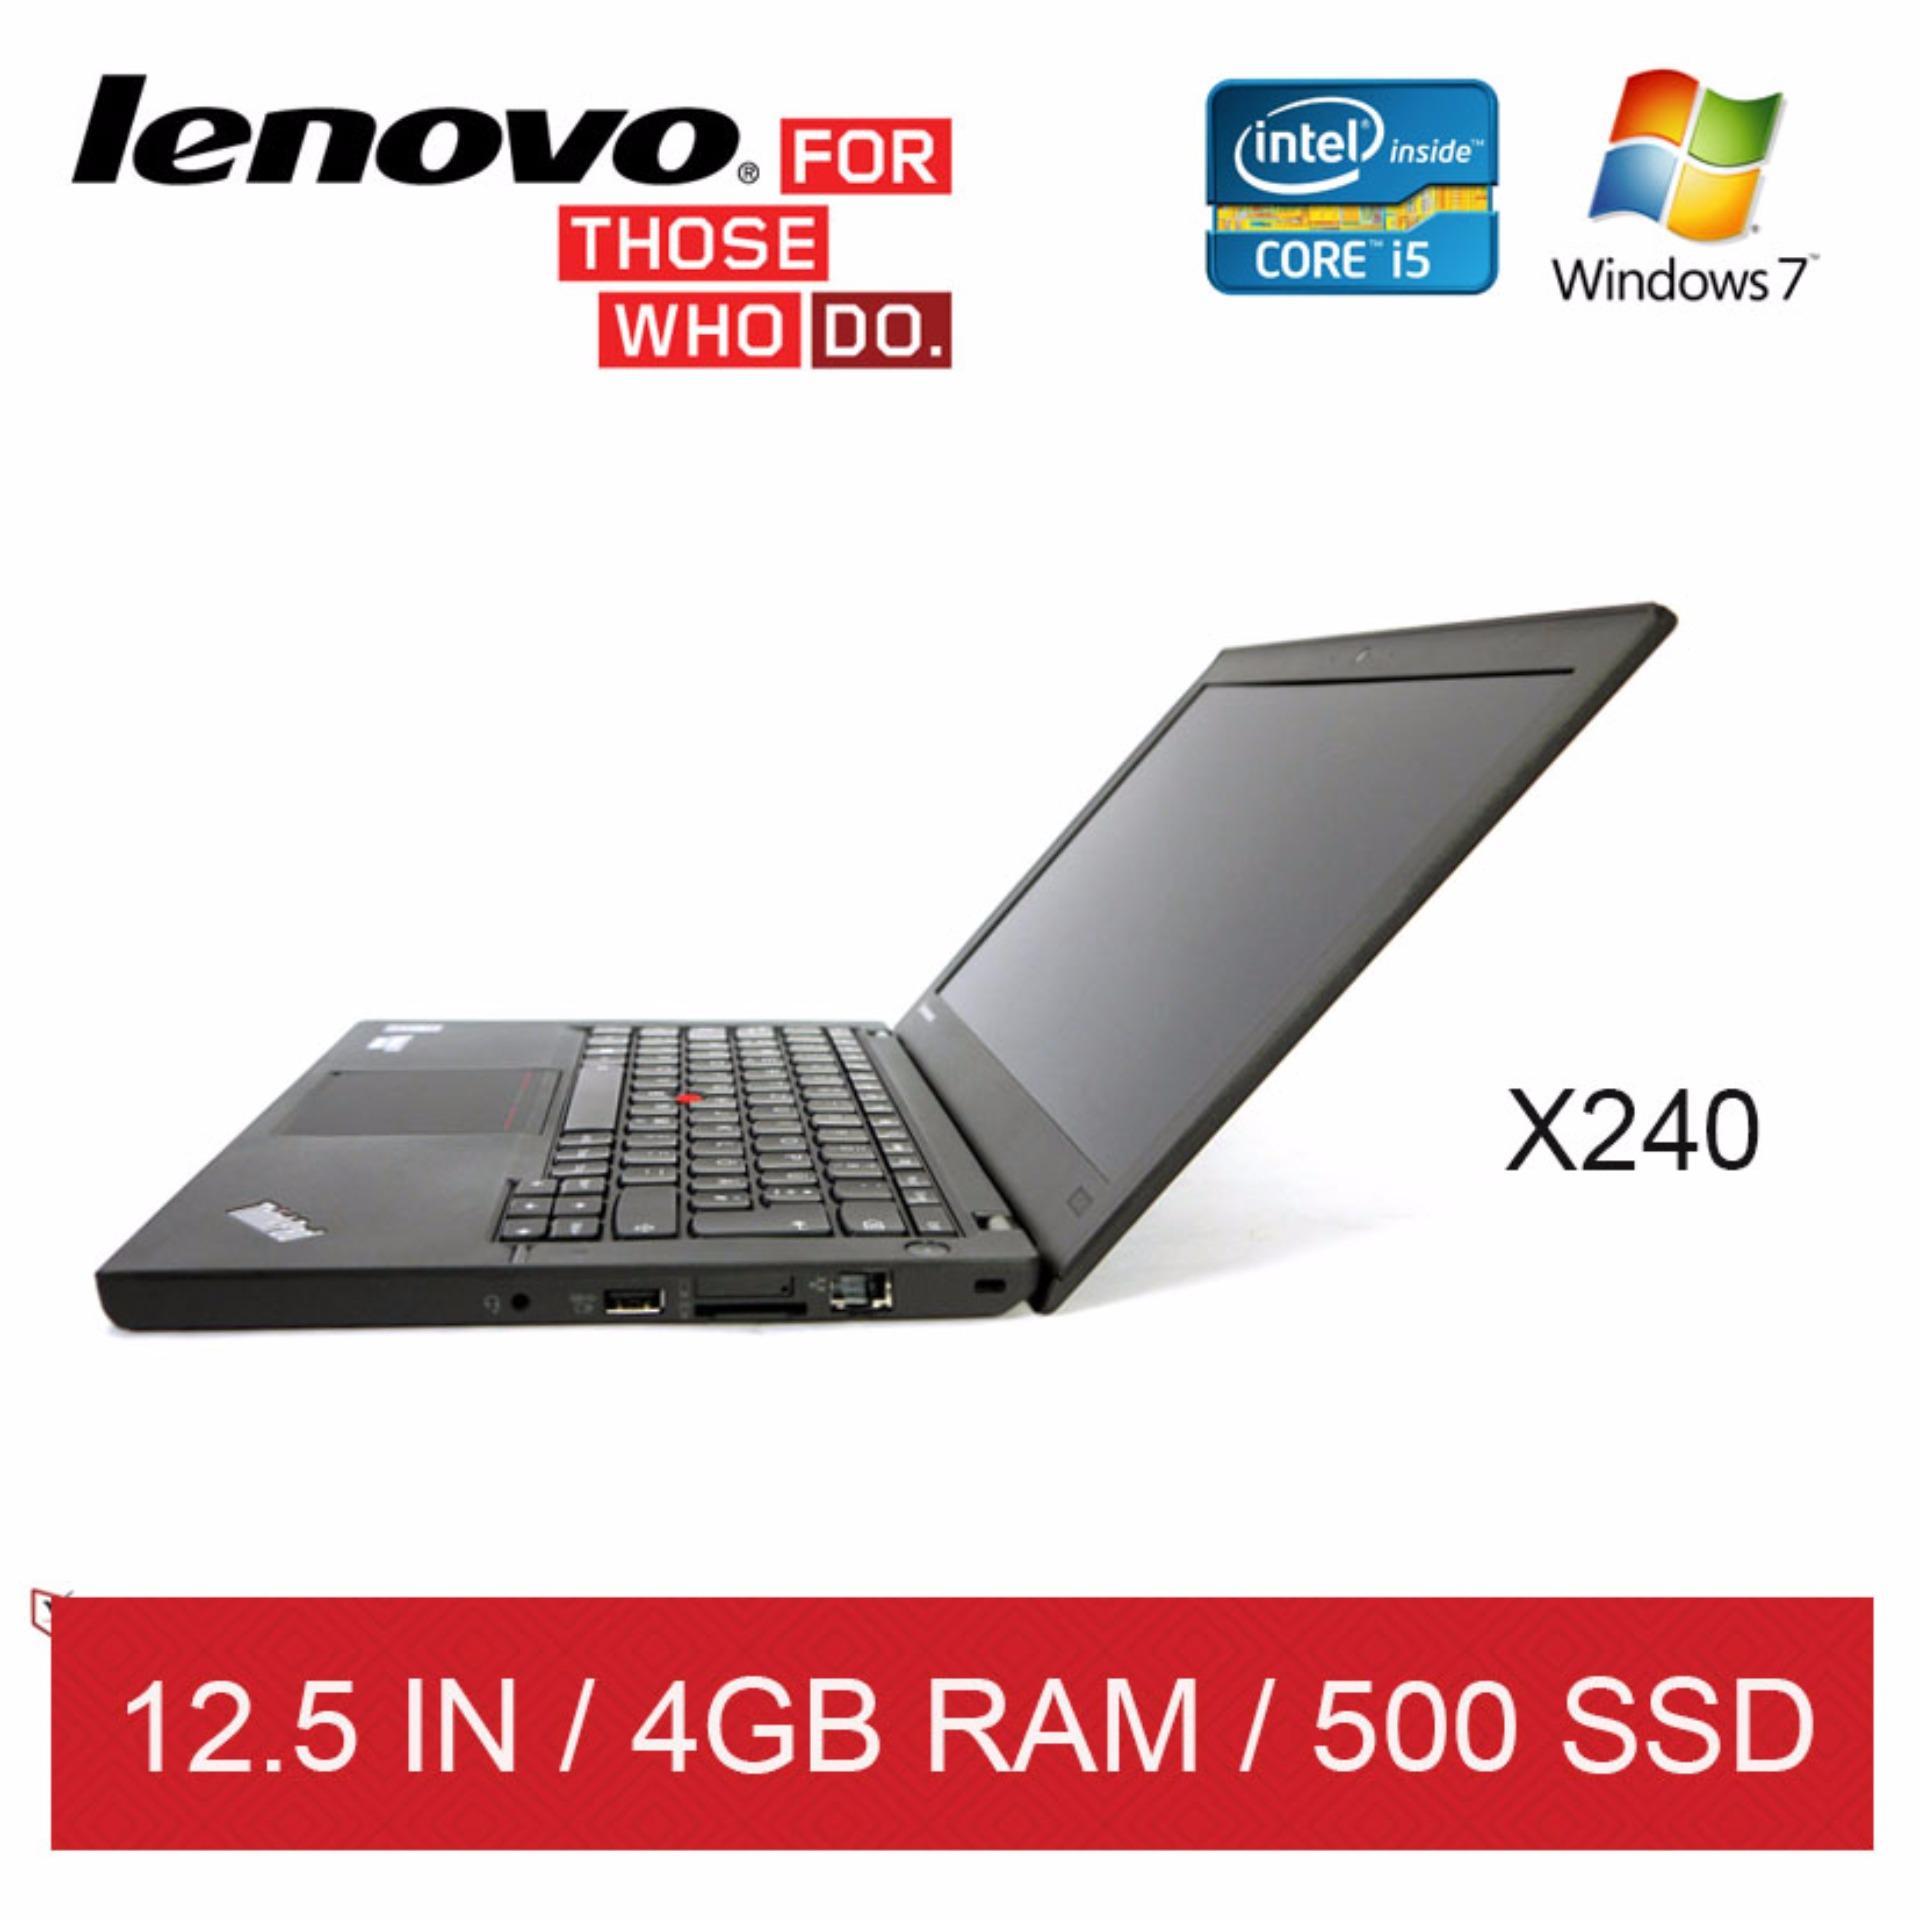 Refurbished Lenovo X240 Laptop / 12.5in / i5 / 4GB RAM / 128GB SSD / W7 / 1mth Warranty